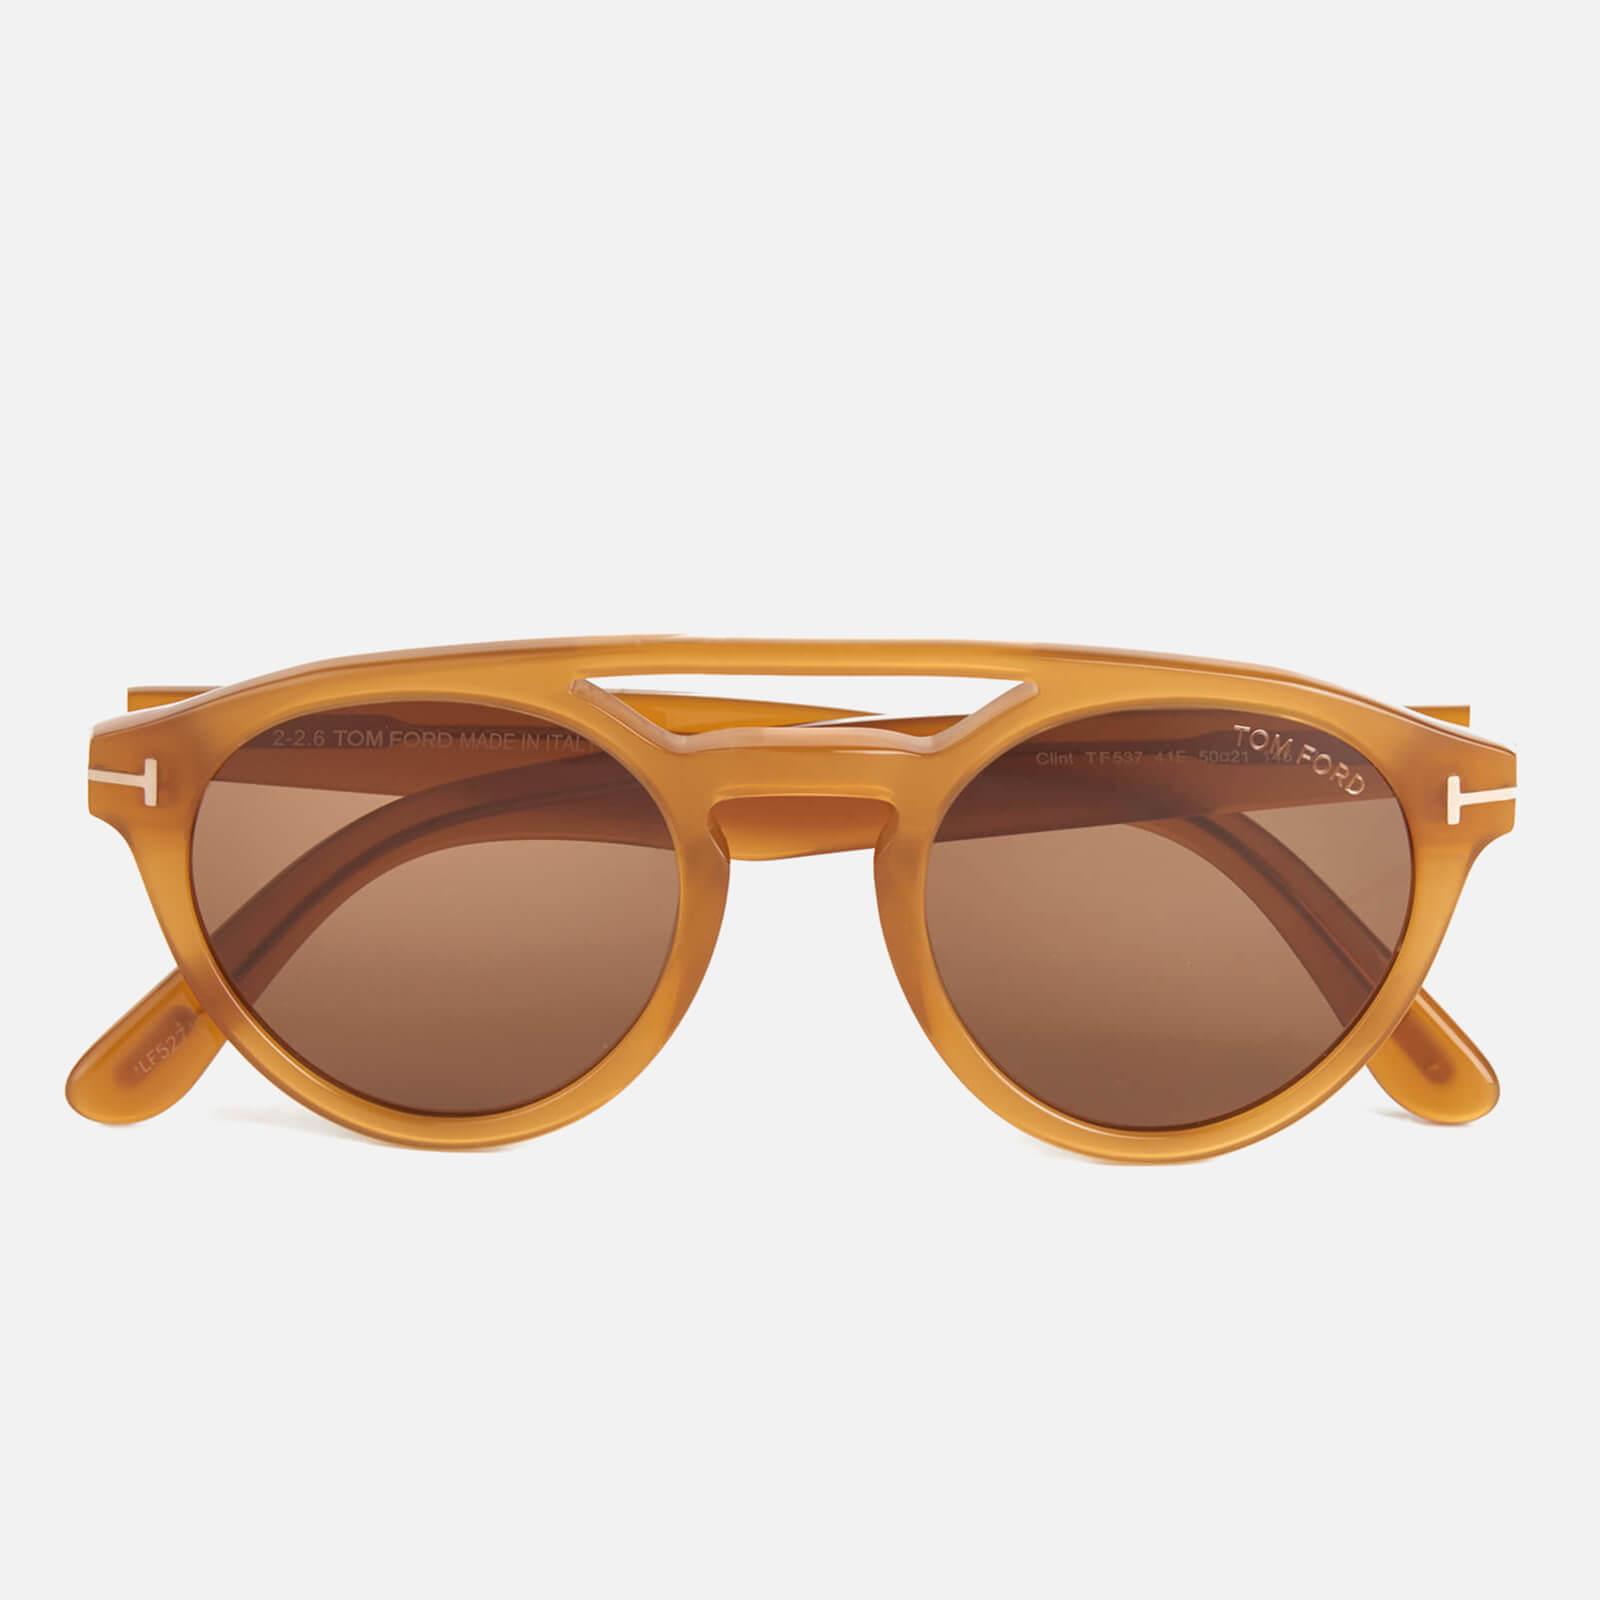 615c047f3a748 Tom Ford Women s Clint Sunglasses - Amber Womens Accessories ...